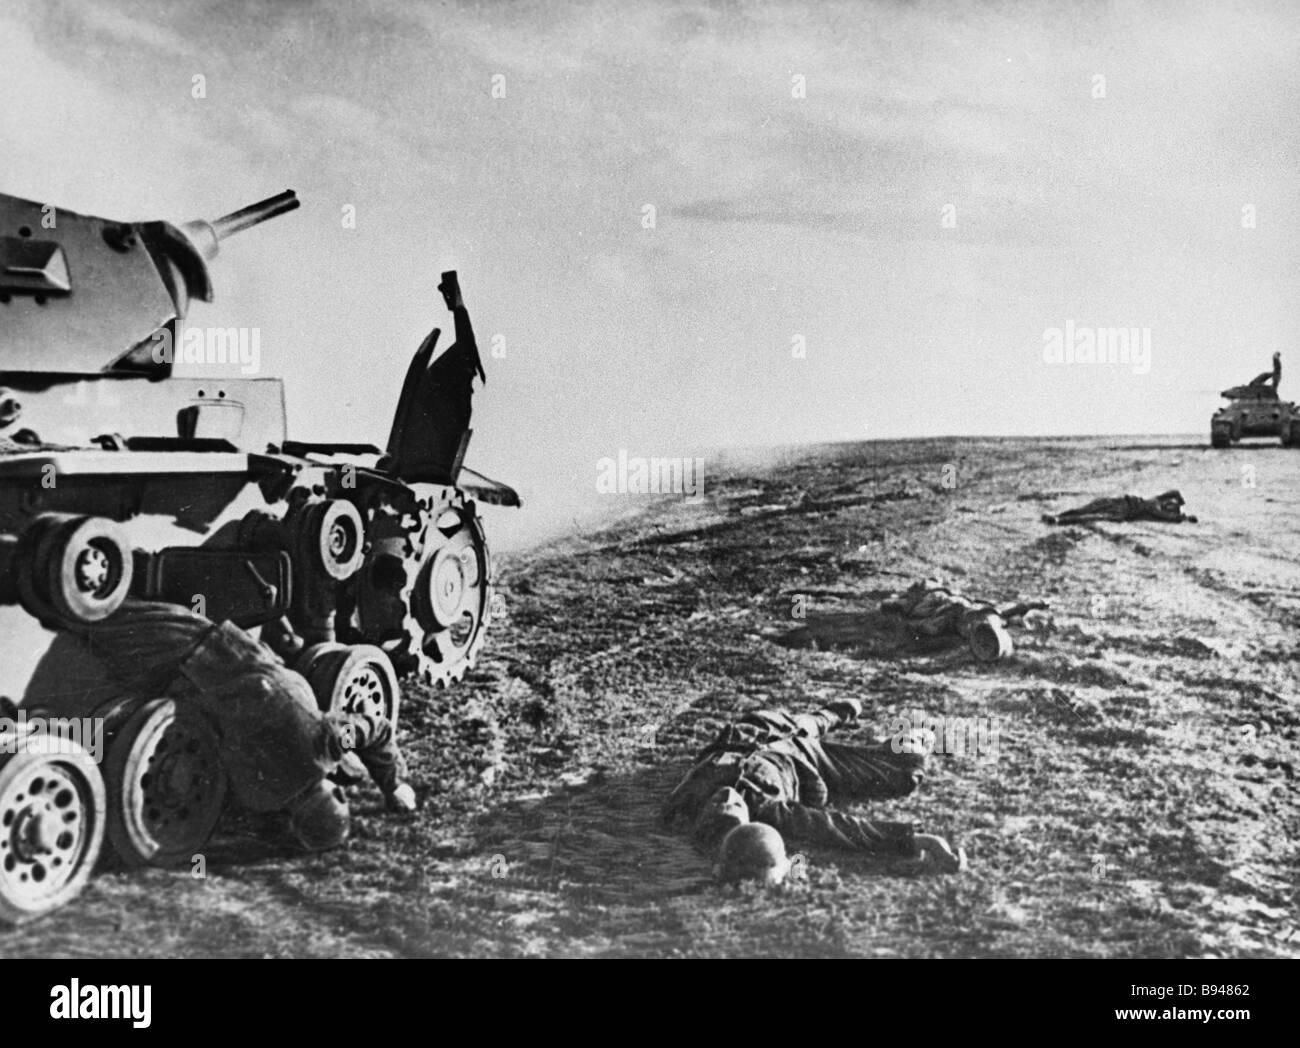 Battlefield - Stock Image